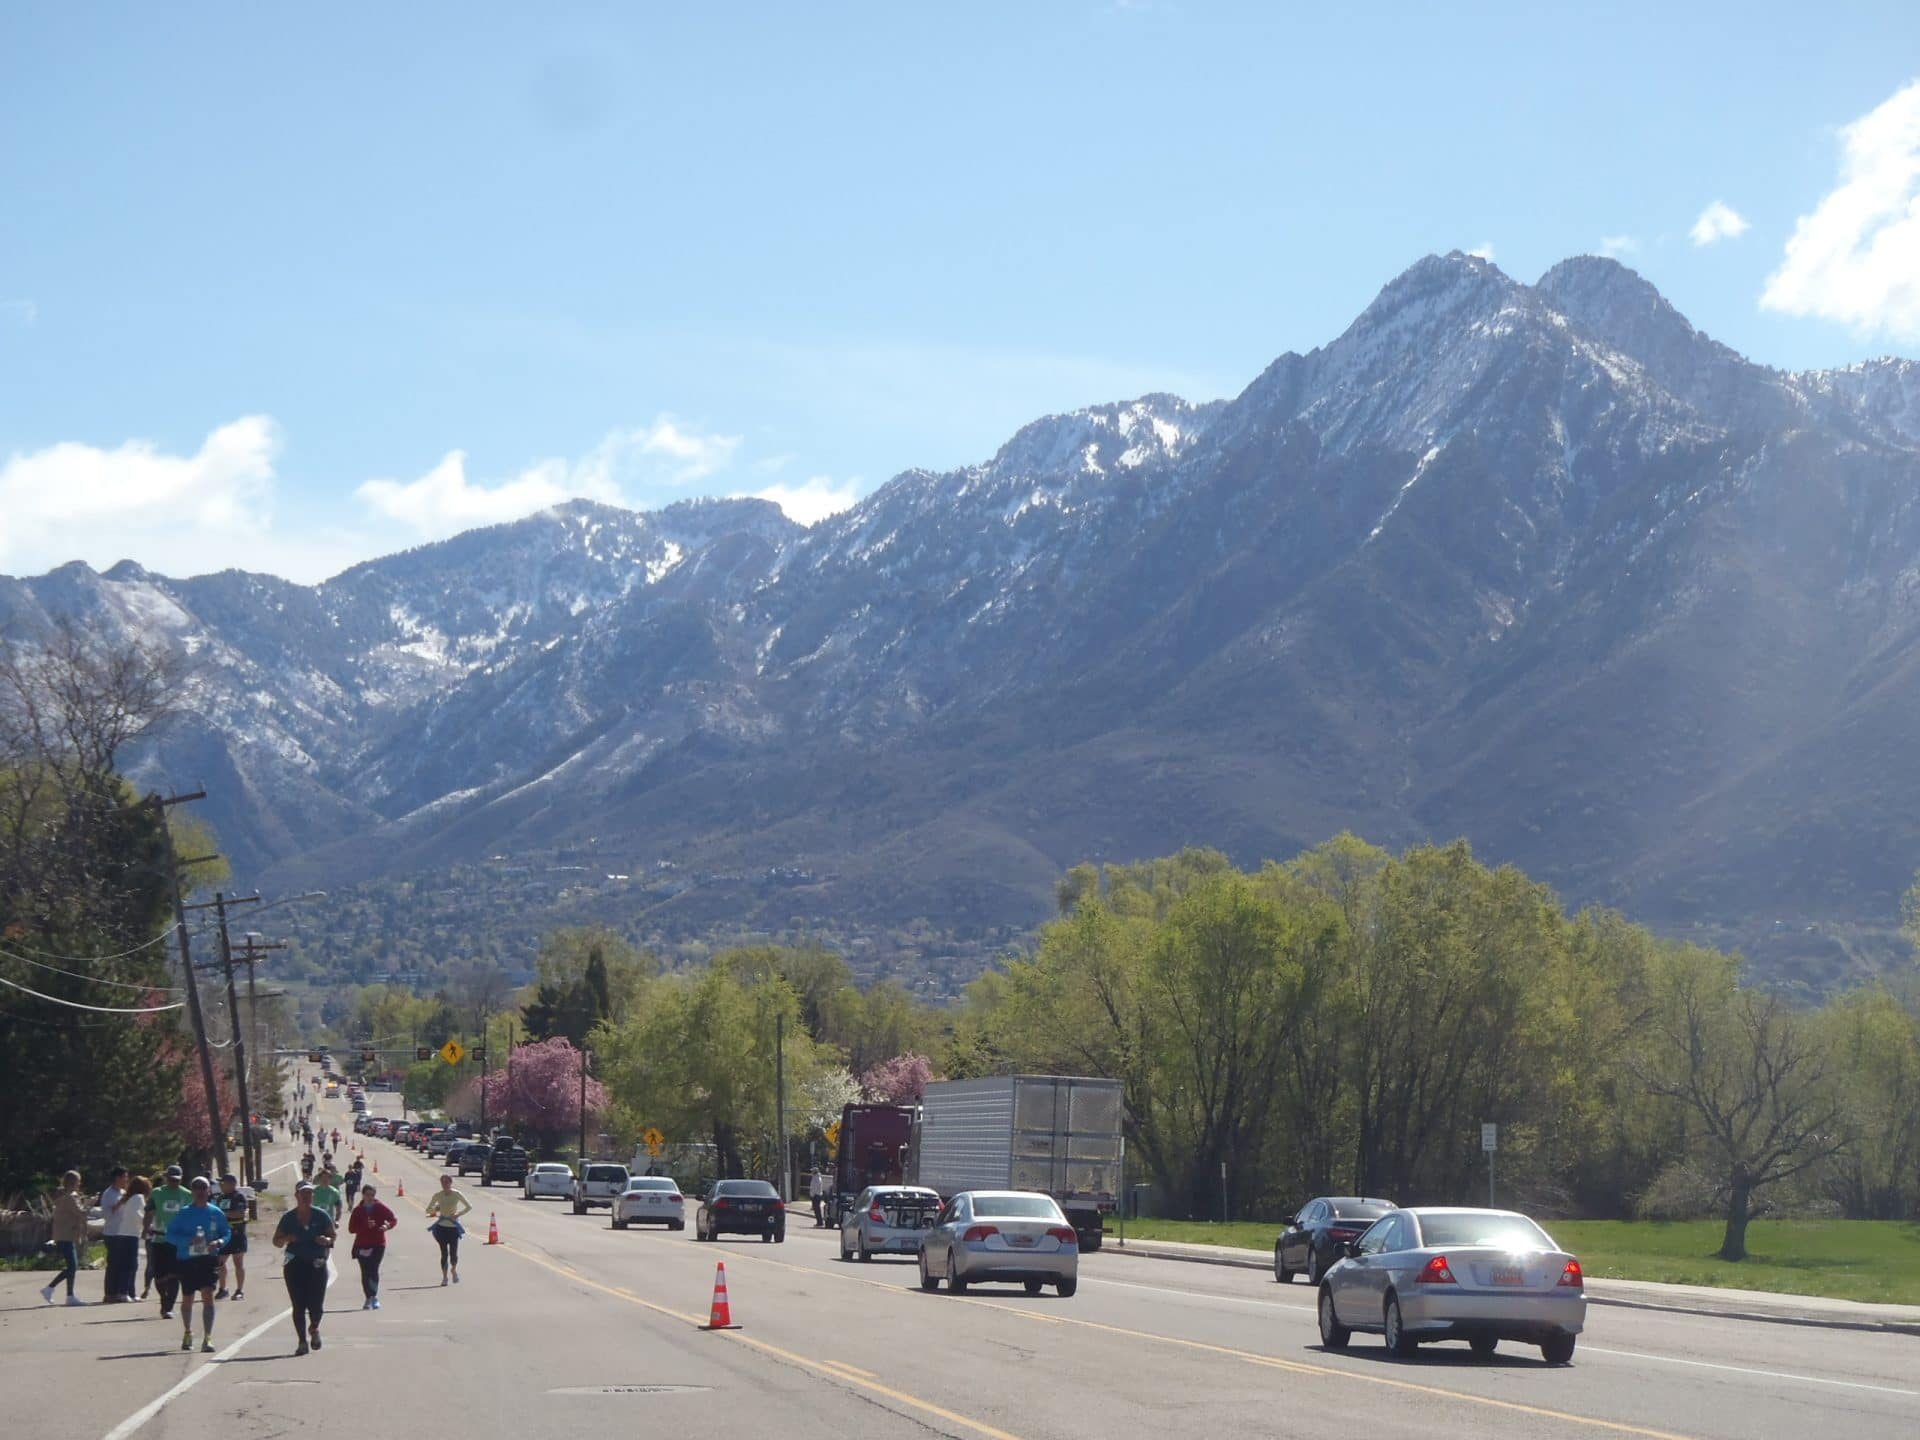 David Redor: Salt Lake City marathon – Beautiful and green ...